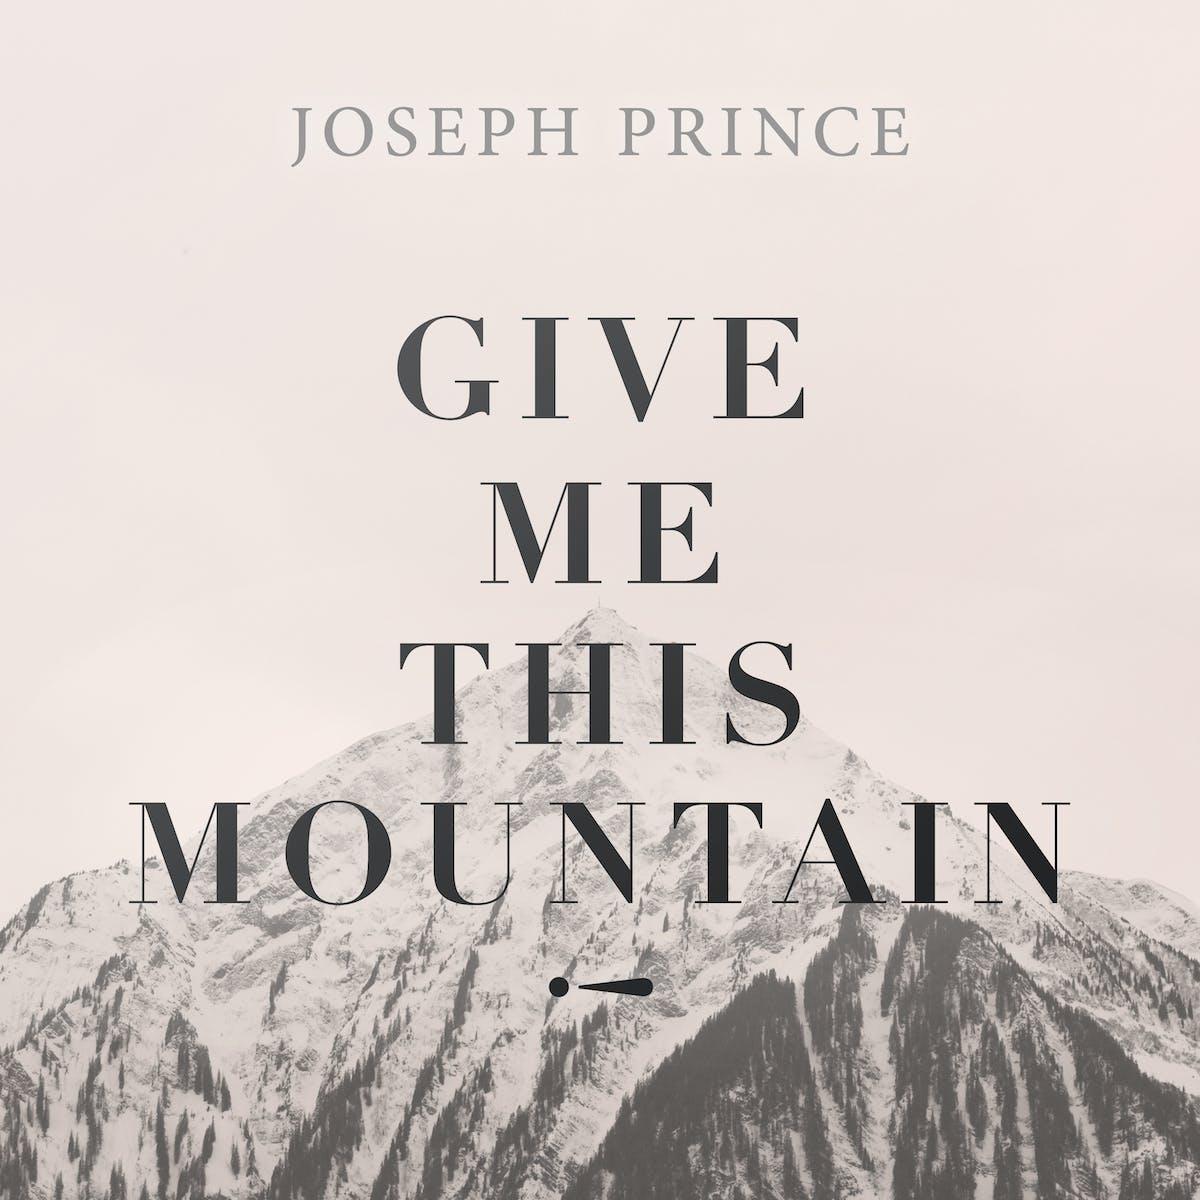 Give Me This Mountain! | Official Joseph Prince Sermon Notes